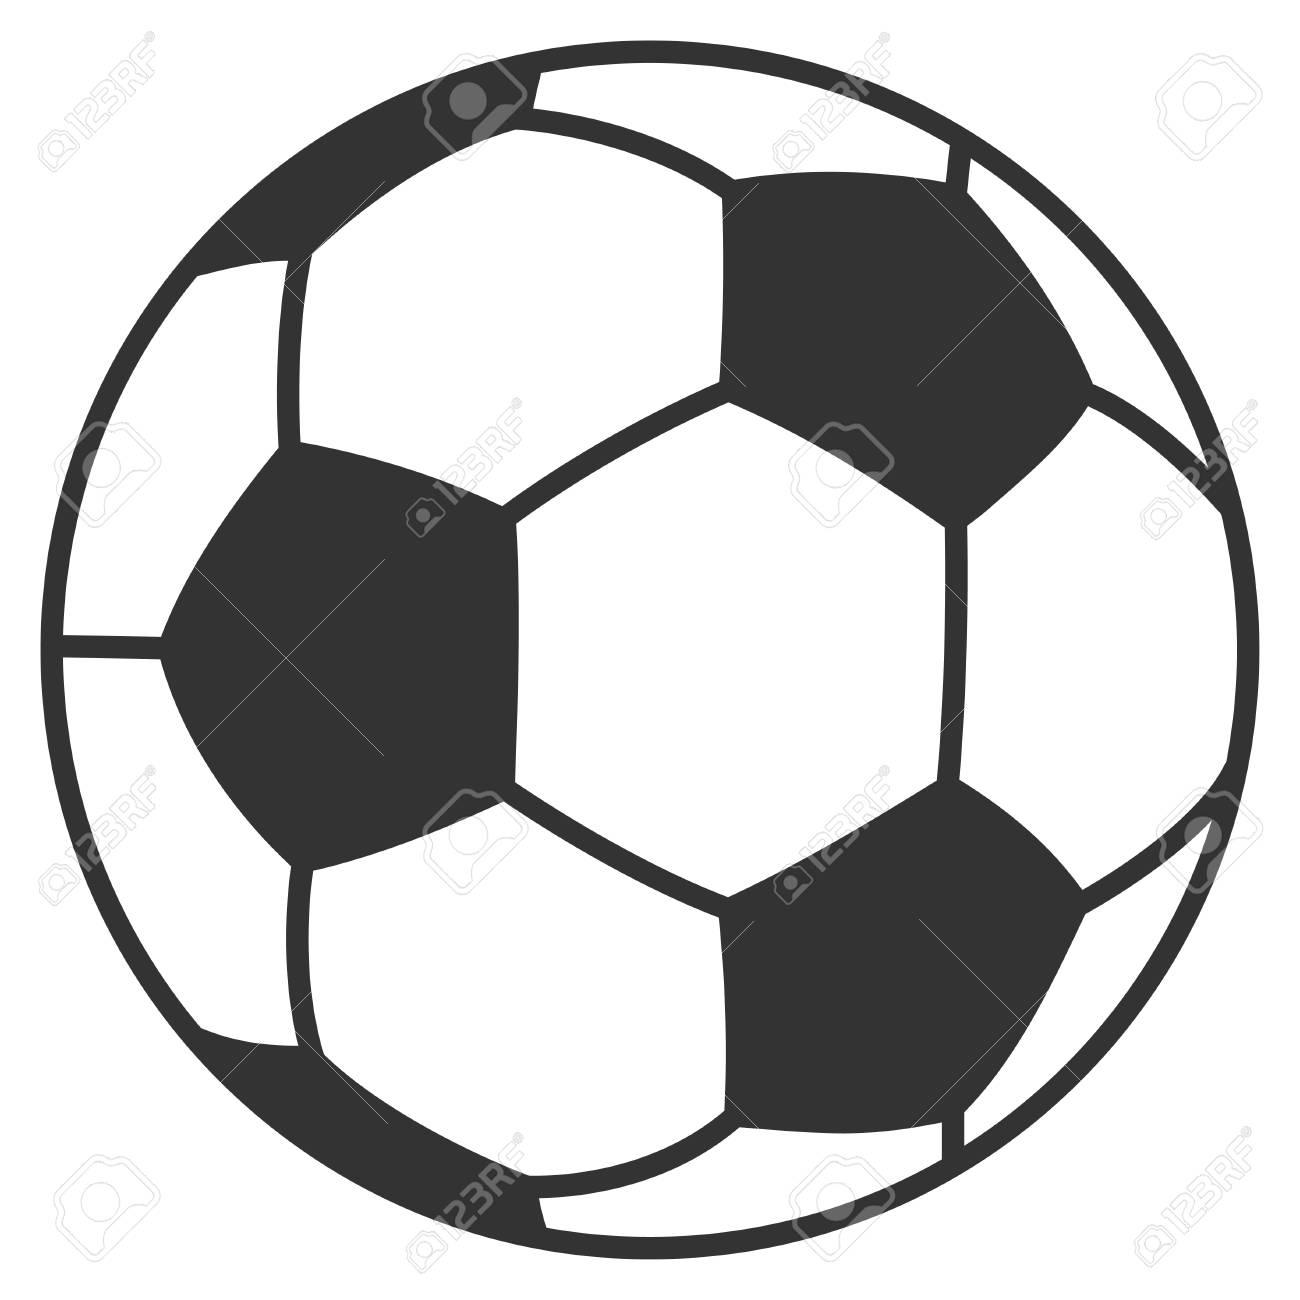 Vector Football Free Download Clip Art.